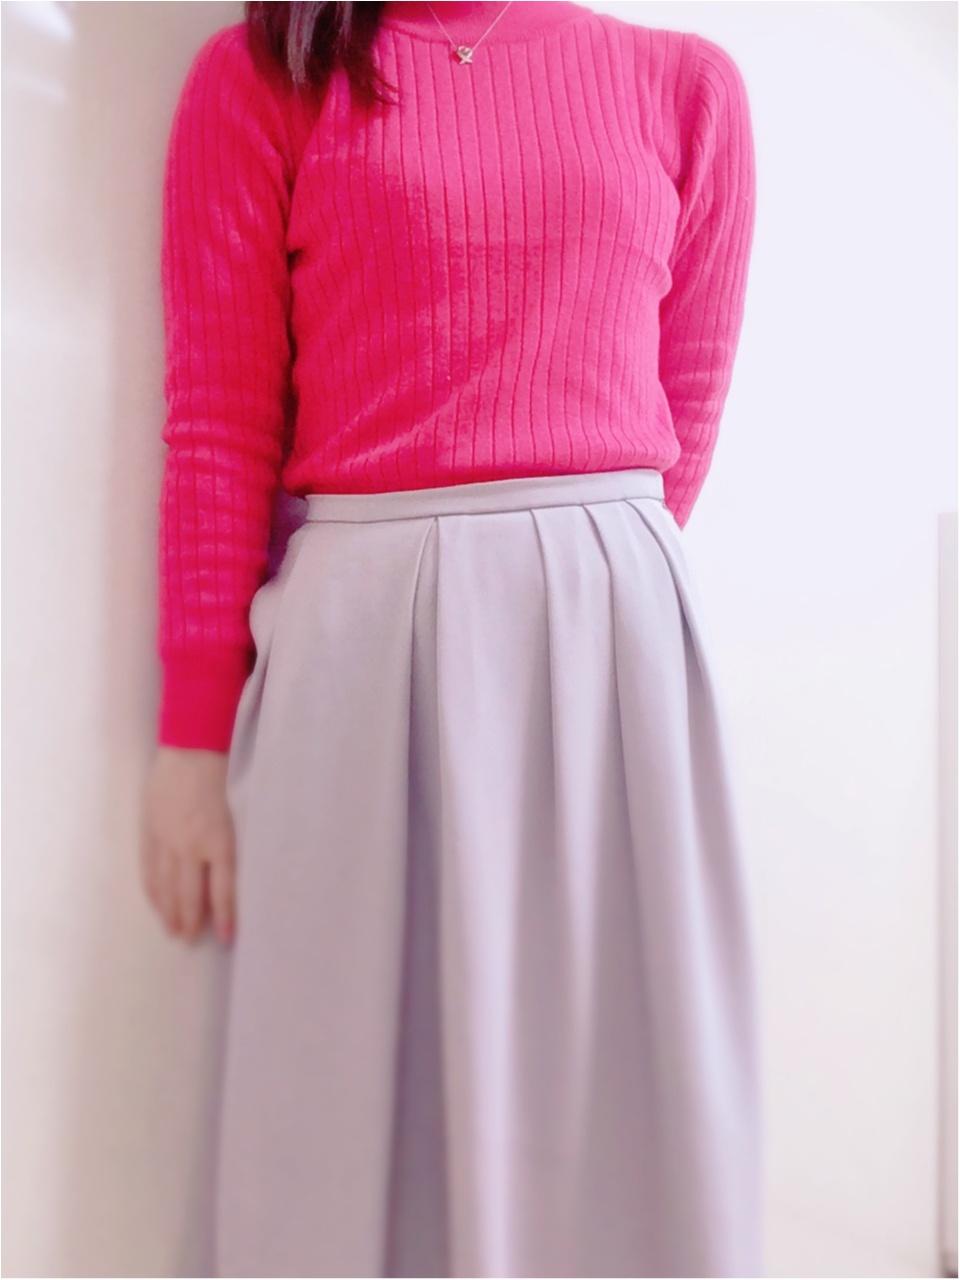 AG by aquagirlがなんと!!2着で4000円以下!一目惚れトップスでつくるオフィスコーデ★_5